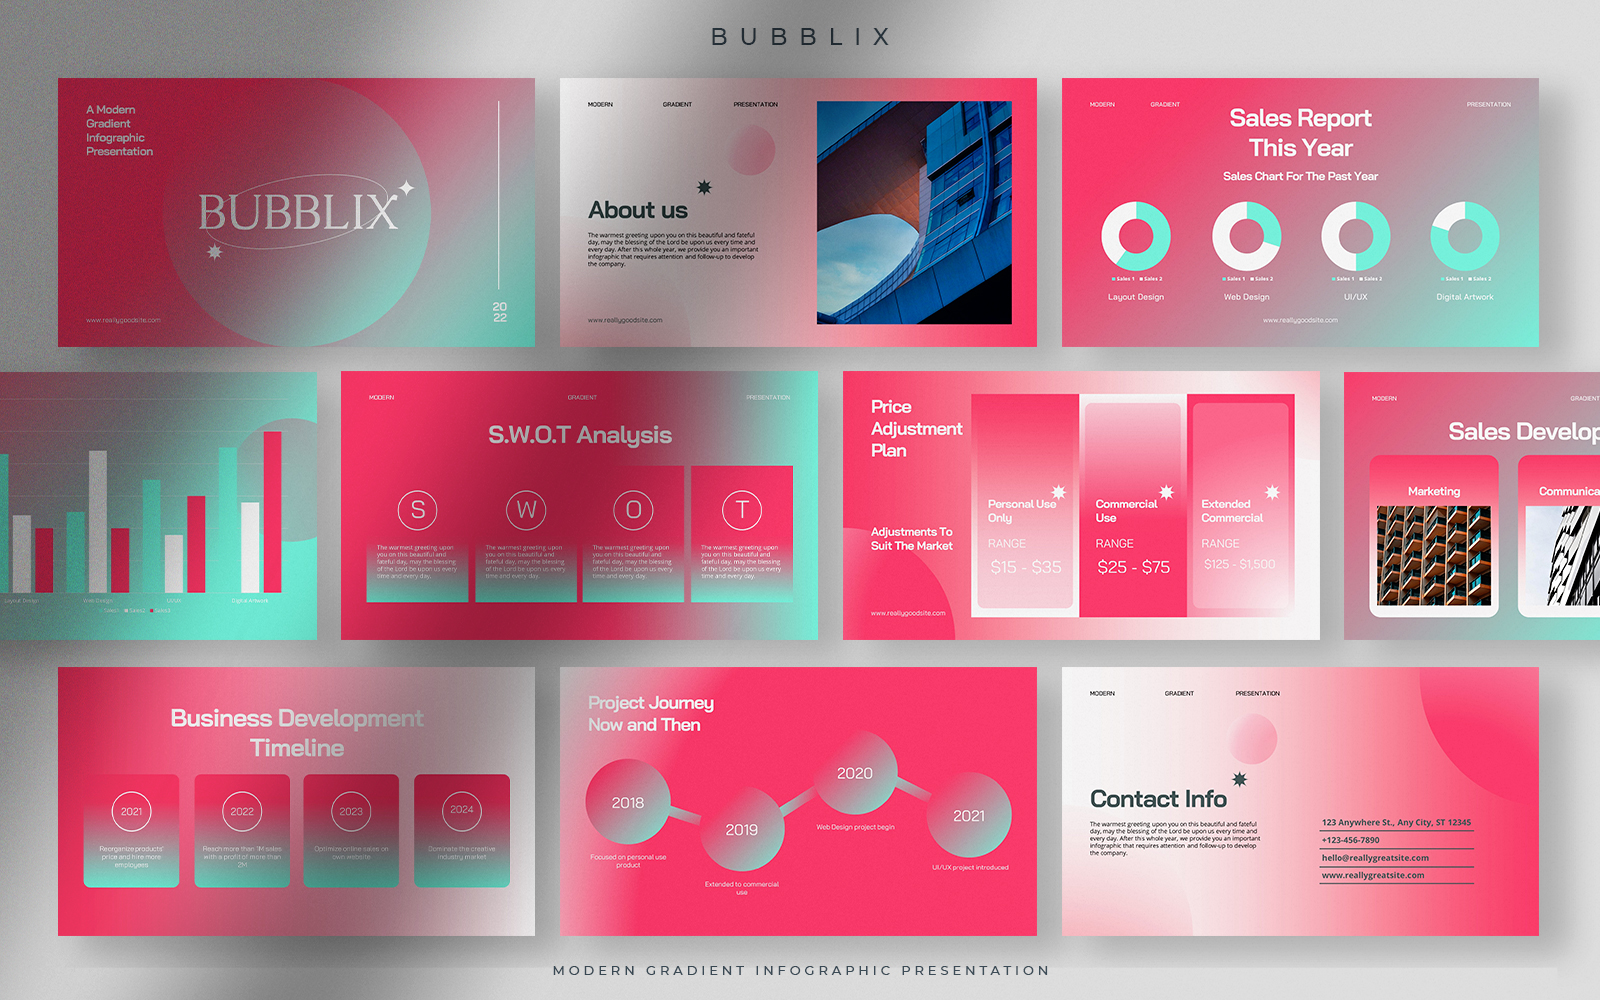 Bubblix - Cotton Candy Modern Gradient Infographic Presentation